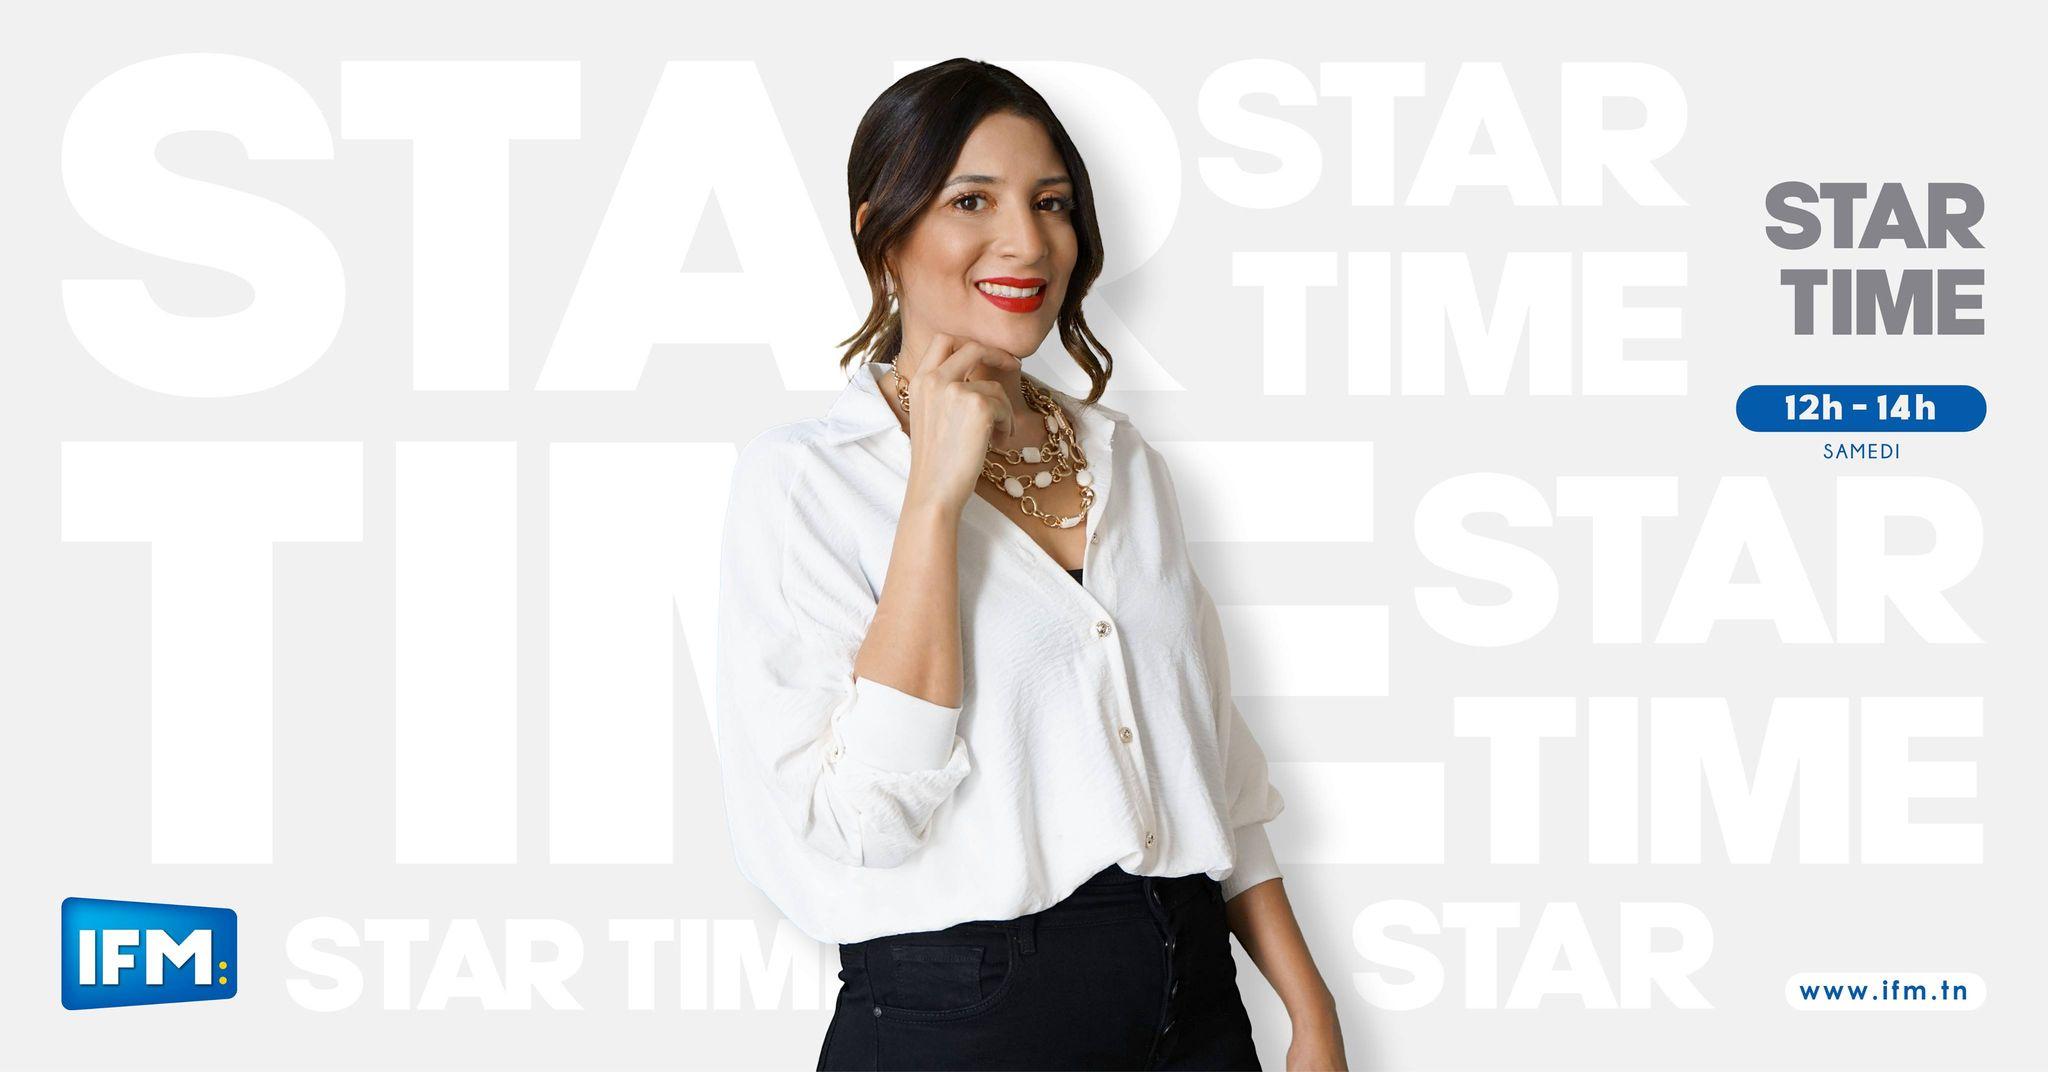 Star time STAR TIME du 29 MAI 2021